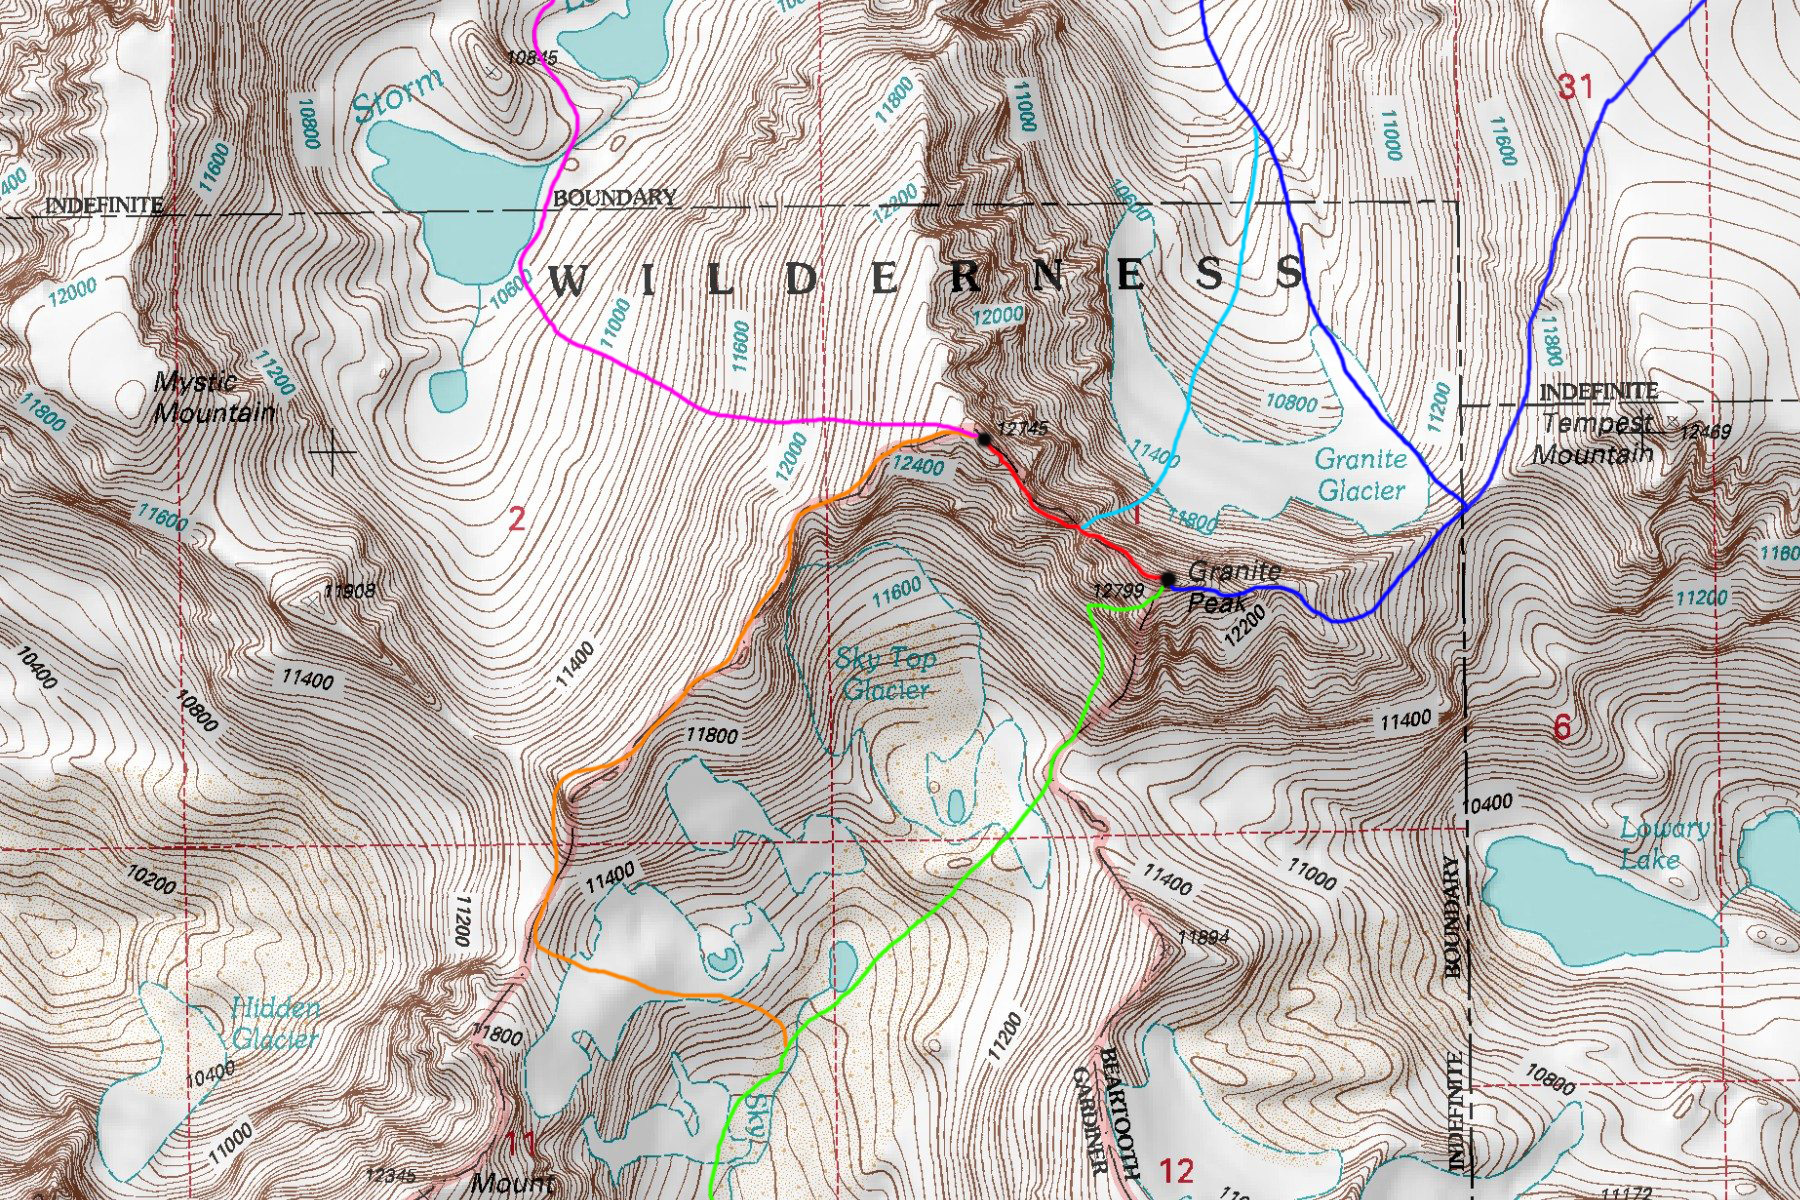 DARK BLUE: Granite Peak East Ridge - Class 4 (Chosen Route via Froze-to-Death Plateau in NE corner) LIGHT BLUE: Granite Peak Notch Couloir - Class 5.4 and Steep Snow GREEN: Granite Peak Southwest Couloir - Class 3 RED: West Granite to Granite Peak Traverse - Class 5.4 ORANGE: West Granite Peak Southwest Ridge - Class 2+ PURPLE: West Granite Peak West Face - Class 2